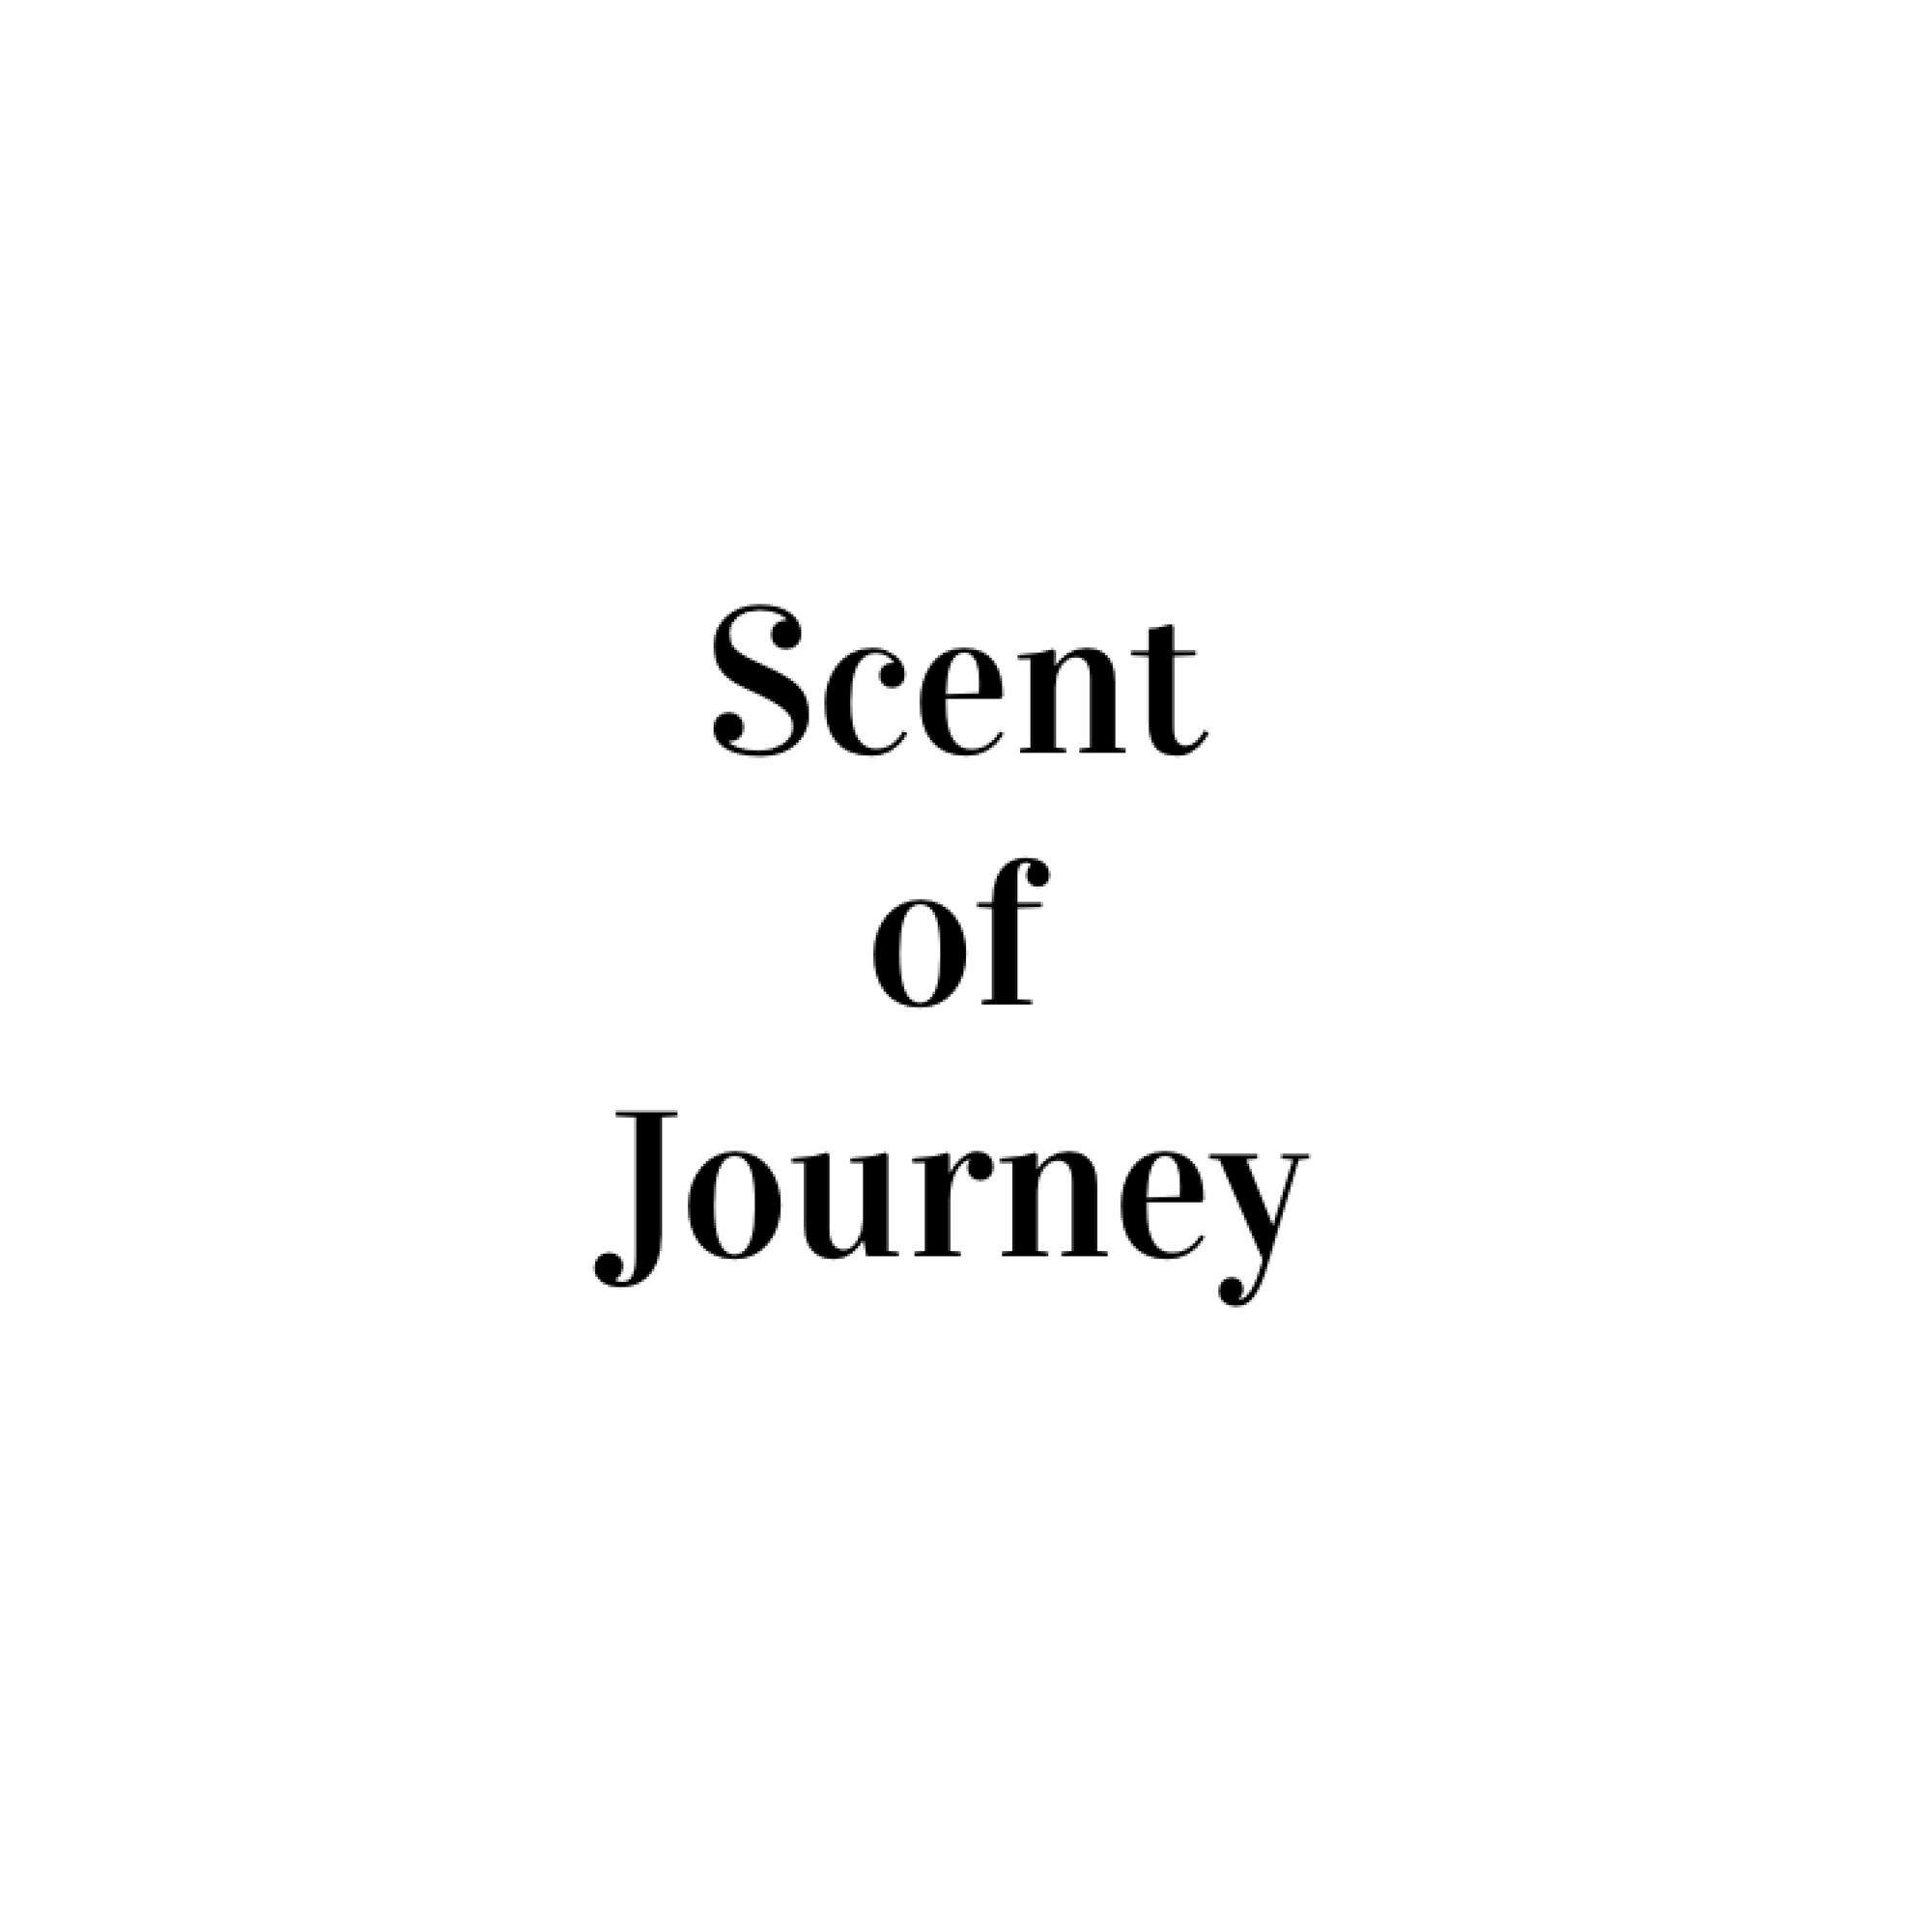 Scent of Journey